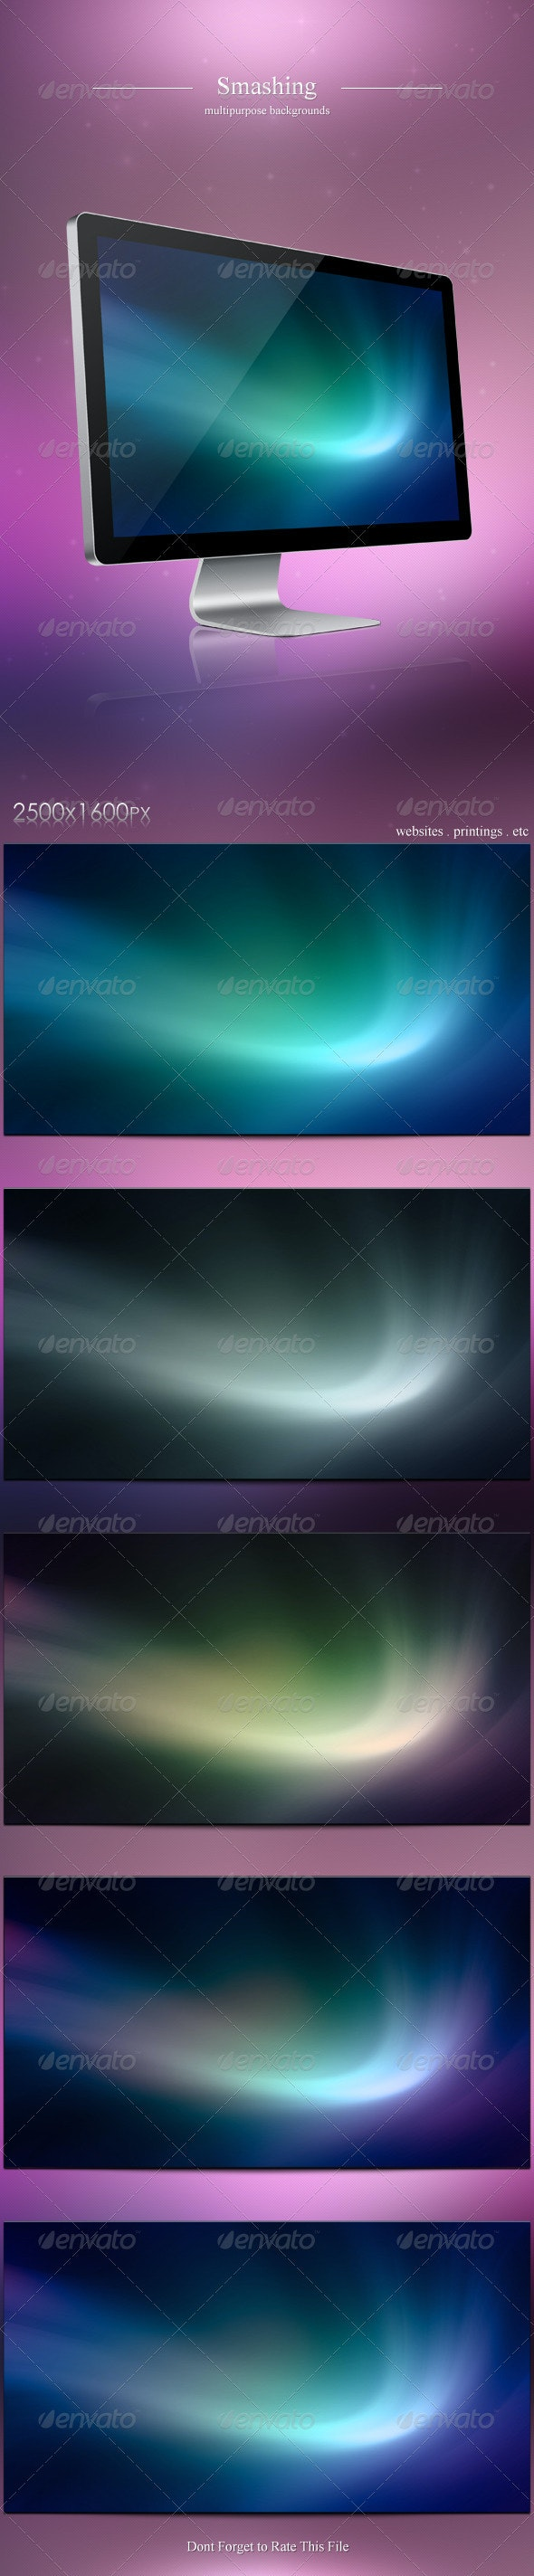 5 Smashing Backgrounds - Backgrounds Graphics